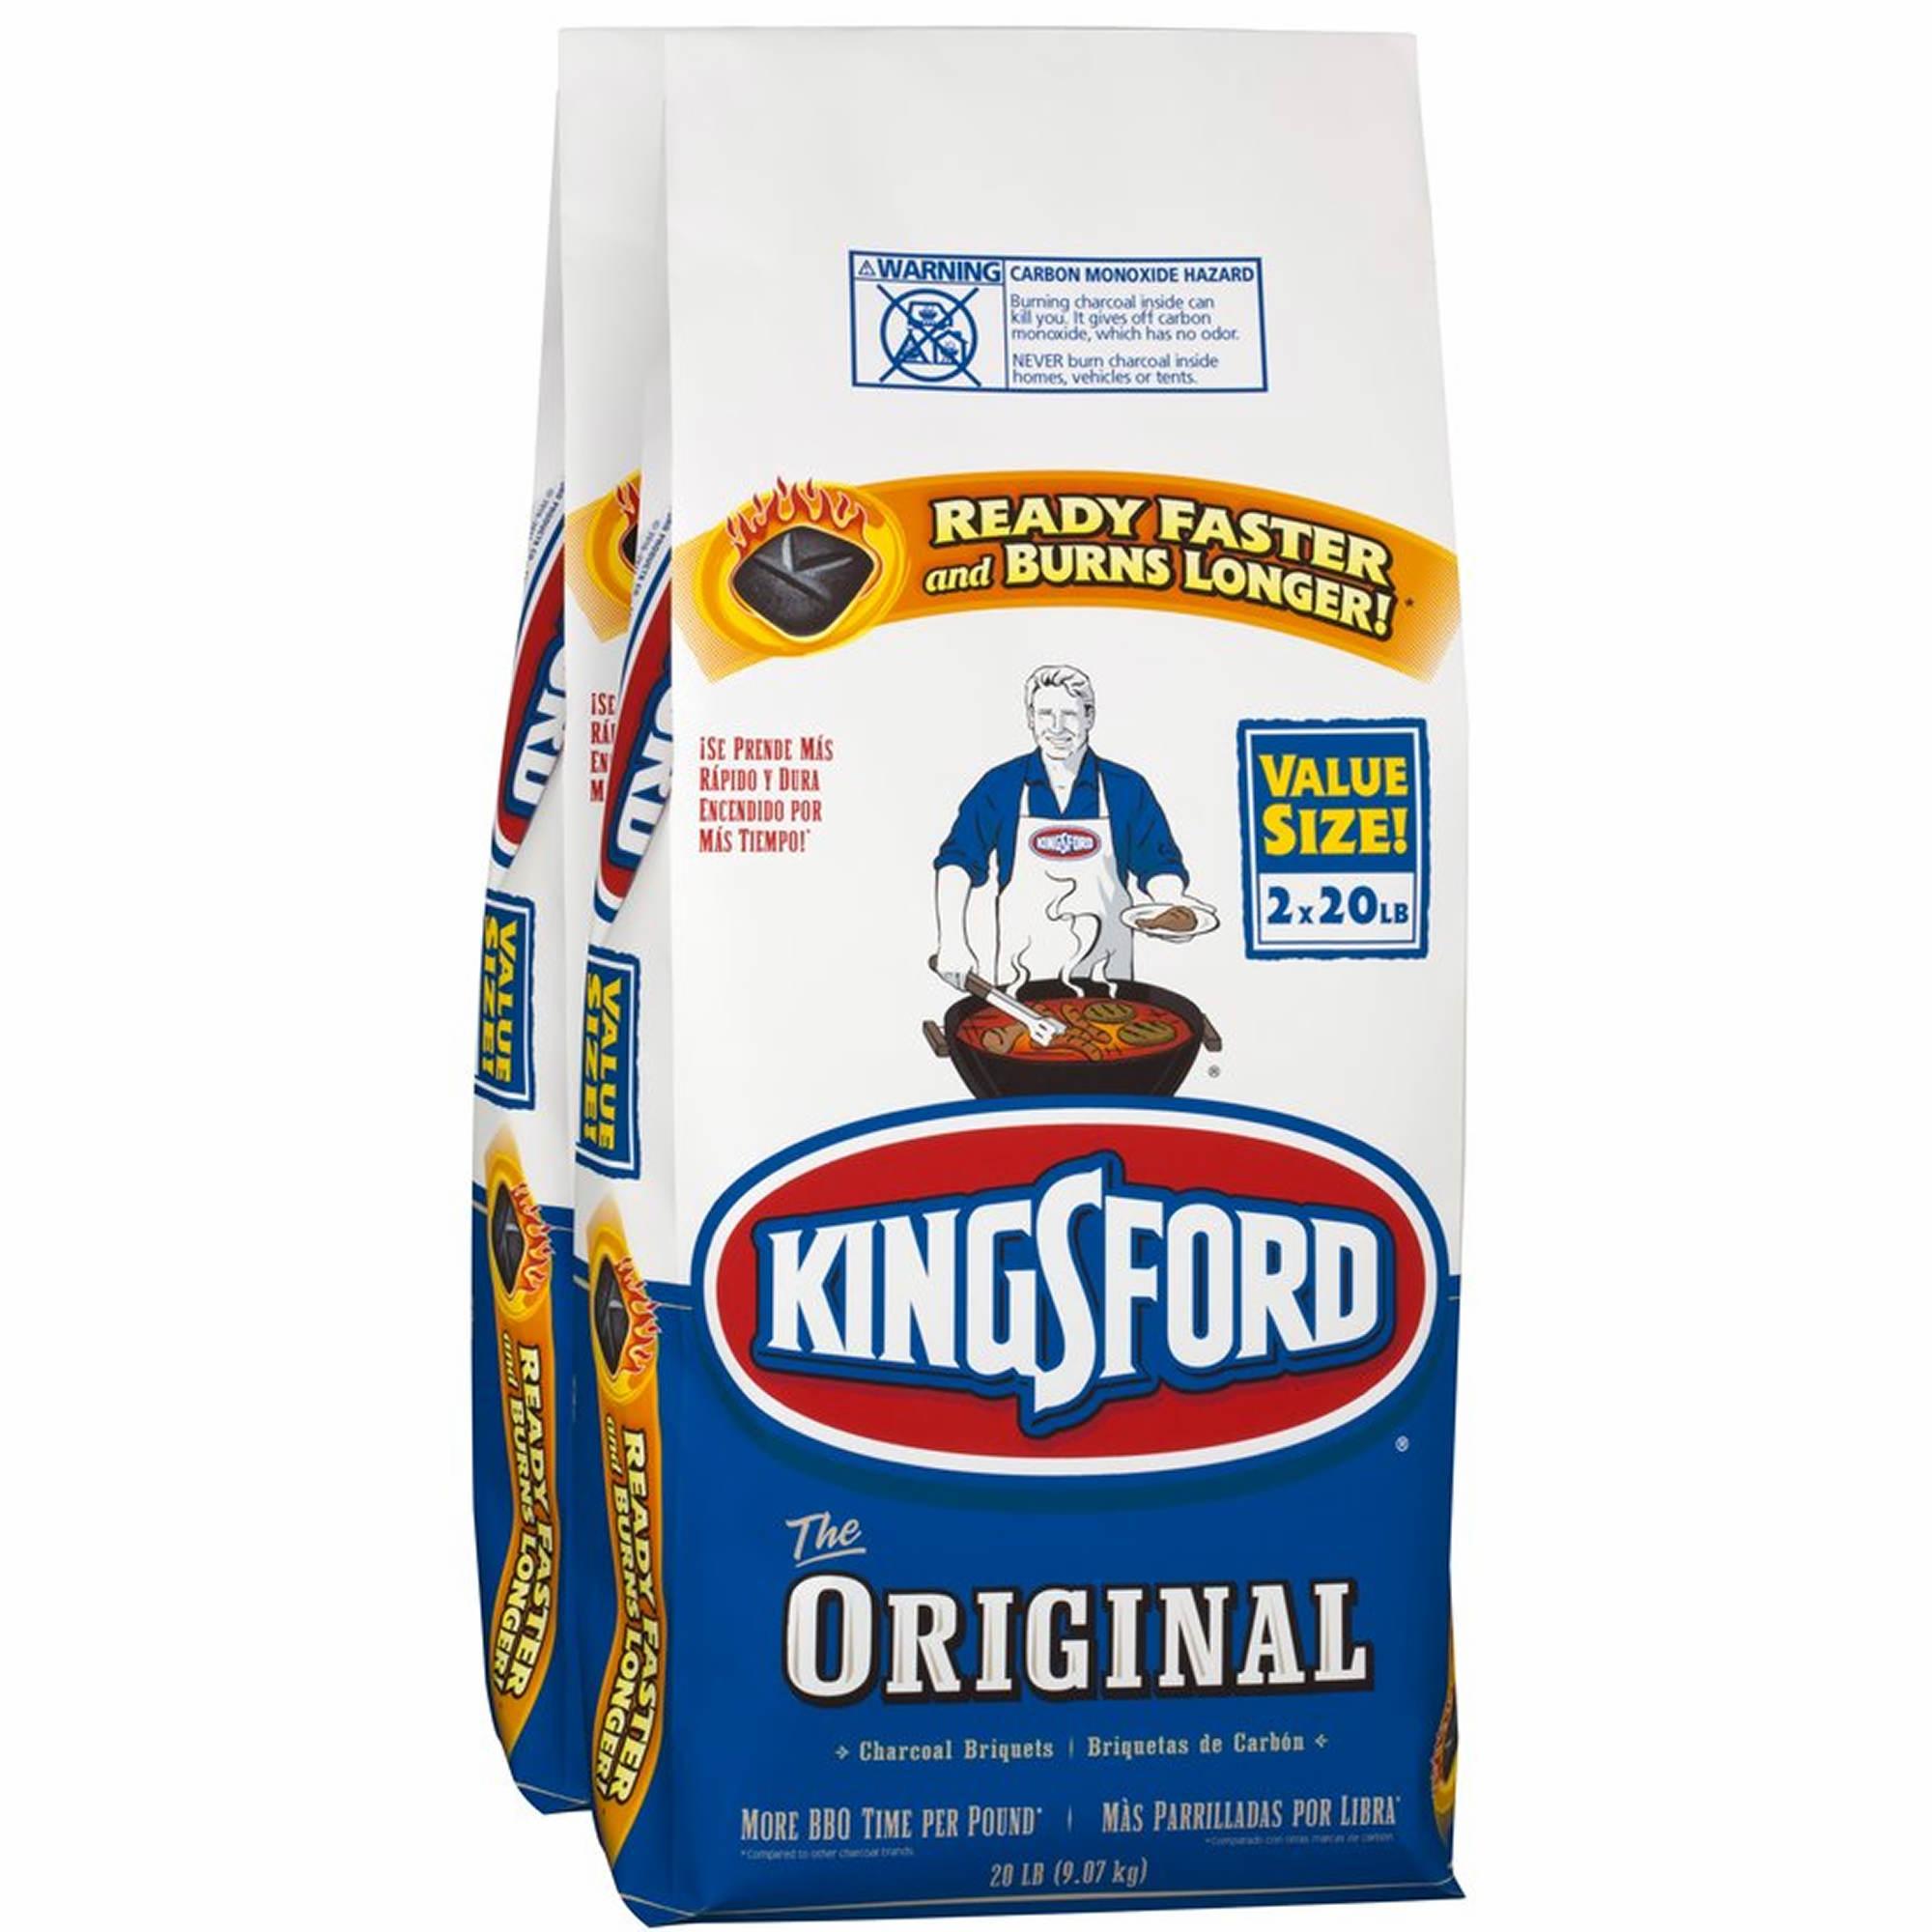 Kingsford charcoal briquettes lbs pk bj s